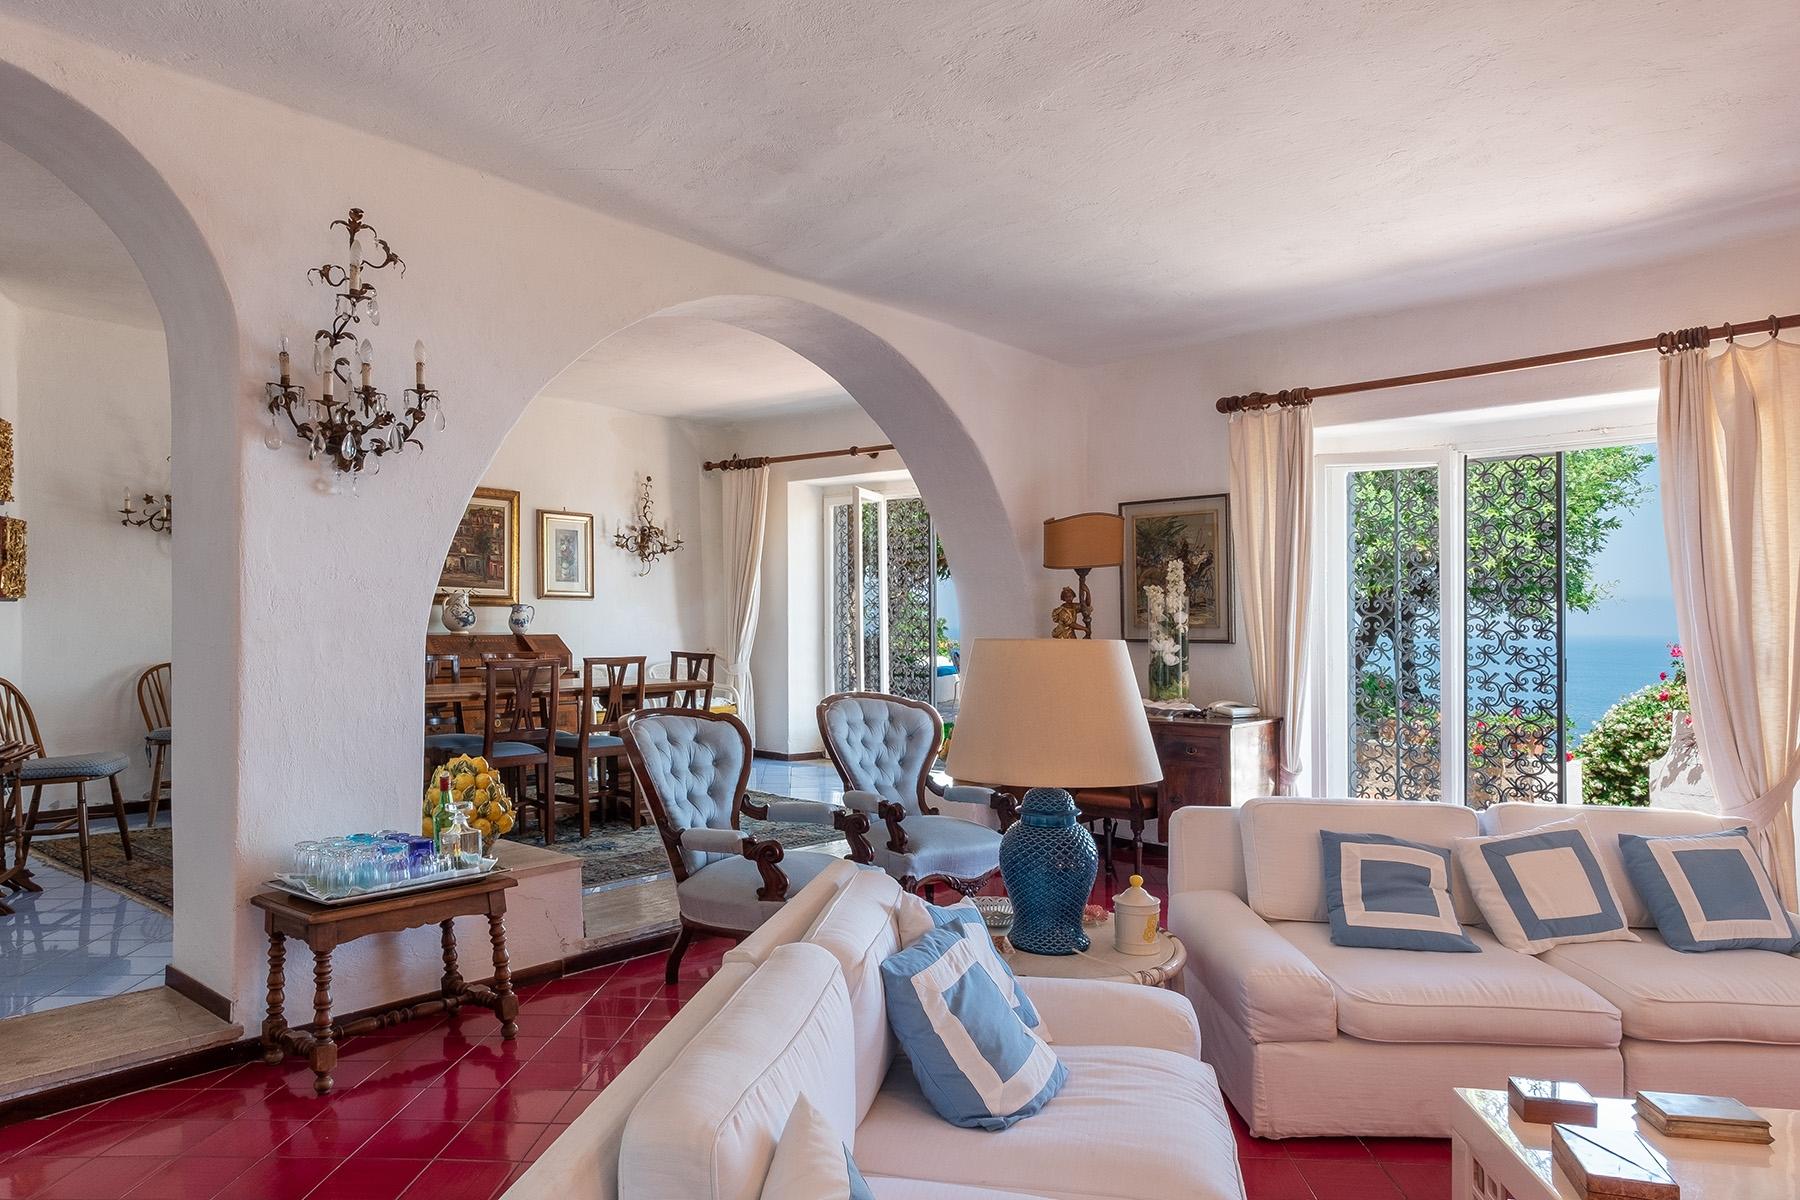 Villa in Vendita a Ischia: 5 locali, 206 mq - Foto 3